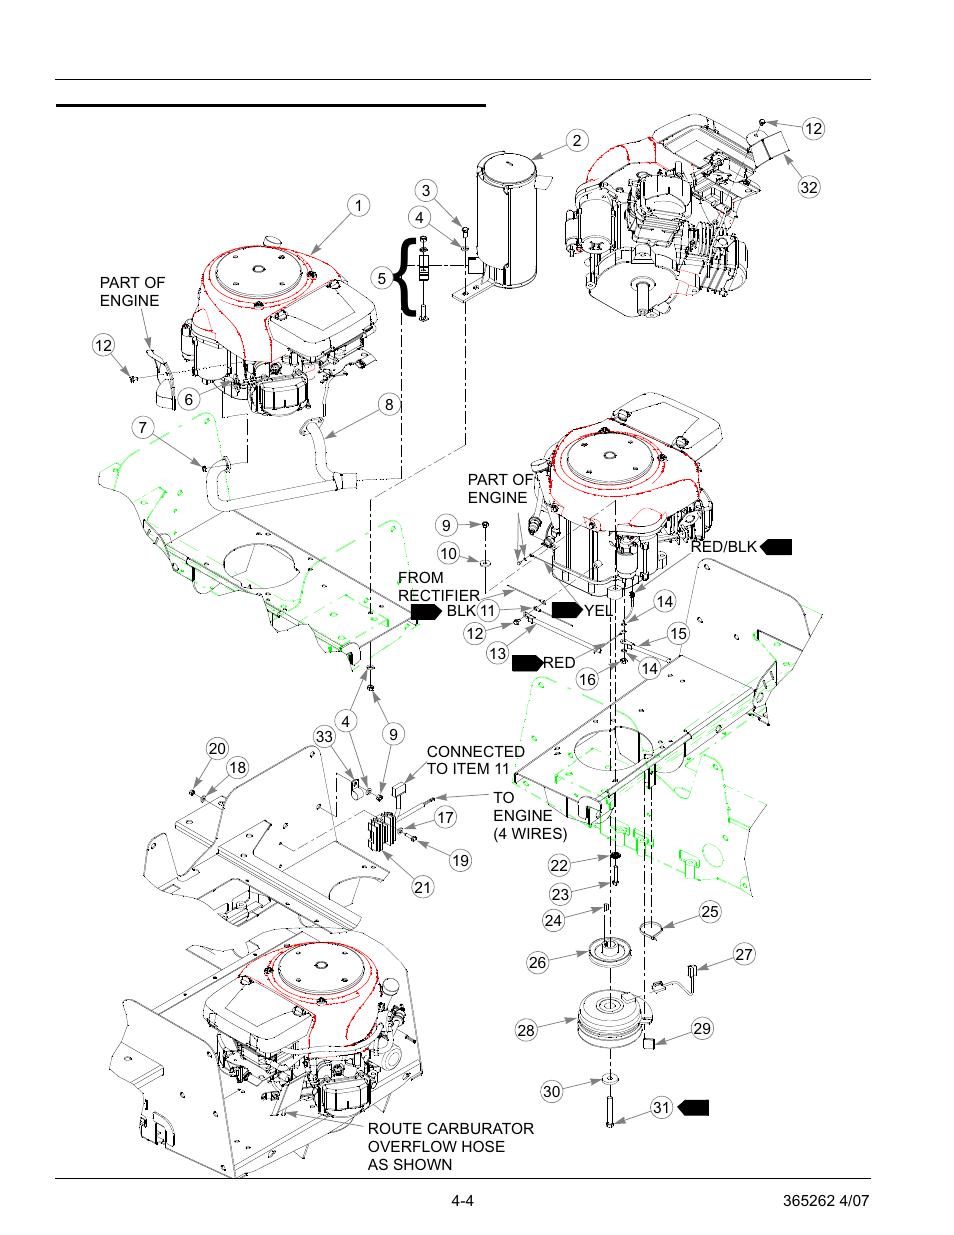 Honda 16 hp engine installation, Honda 16 hp engine